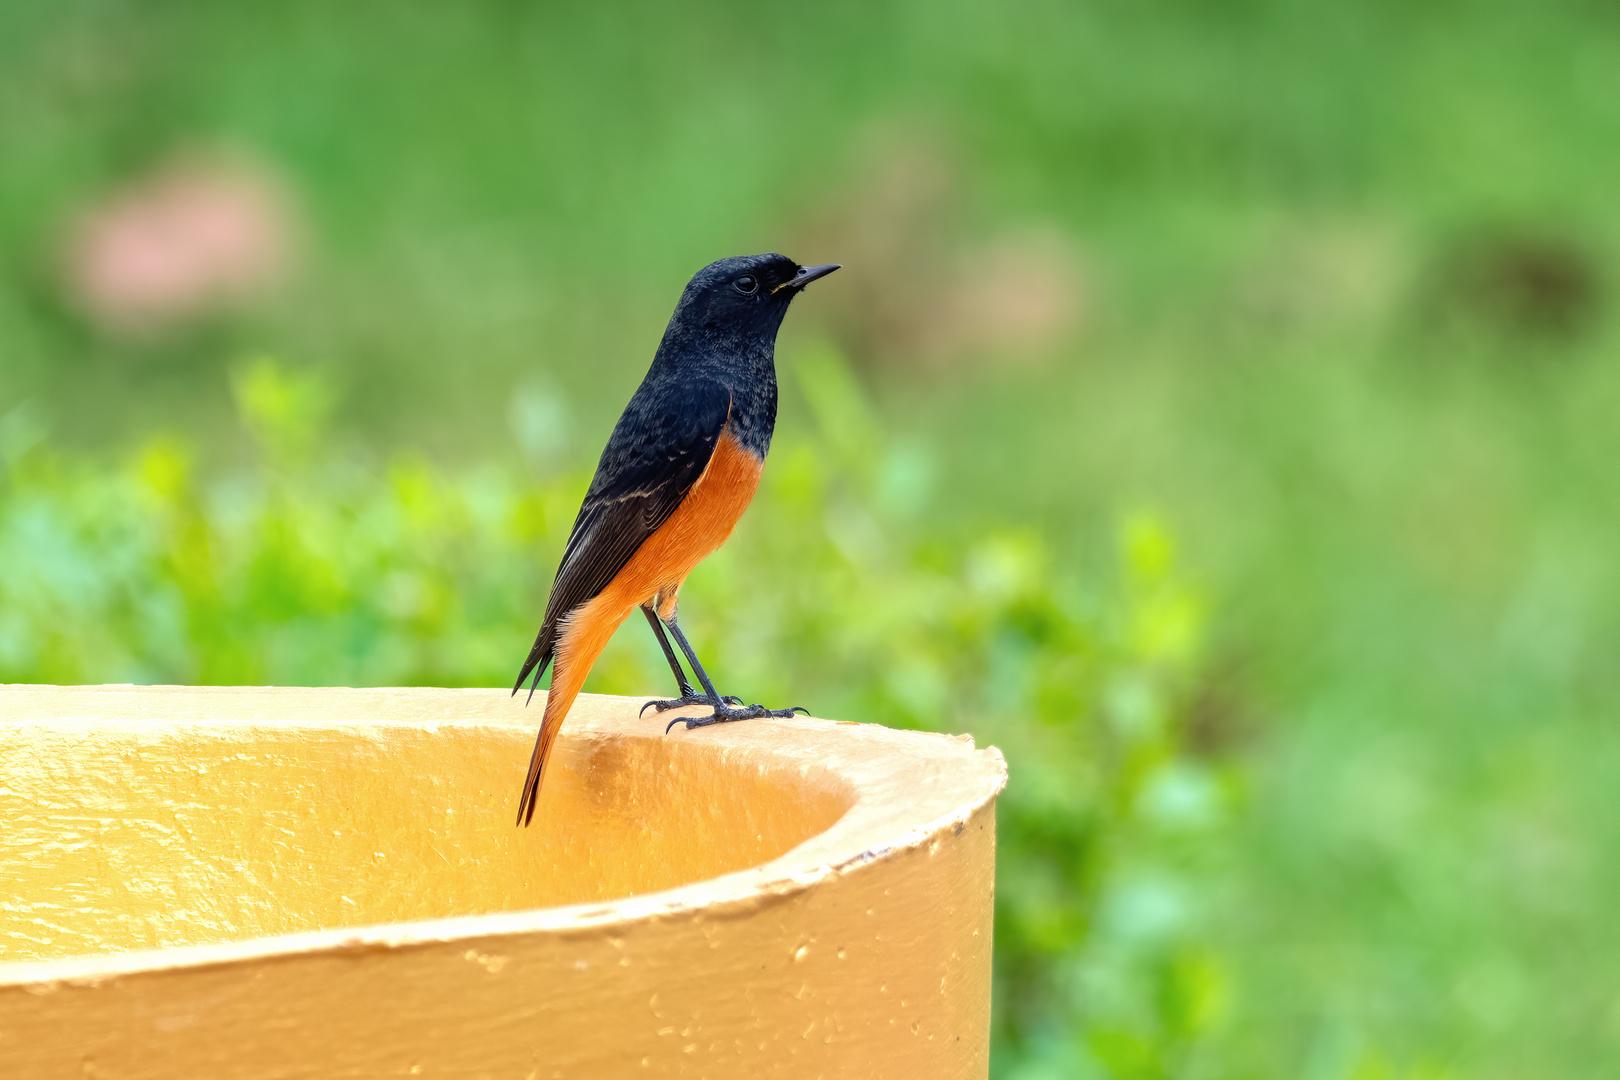 Black Redstart rufiventris